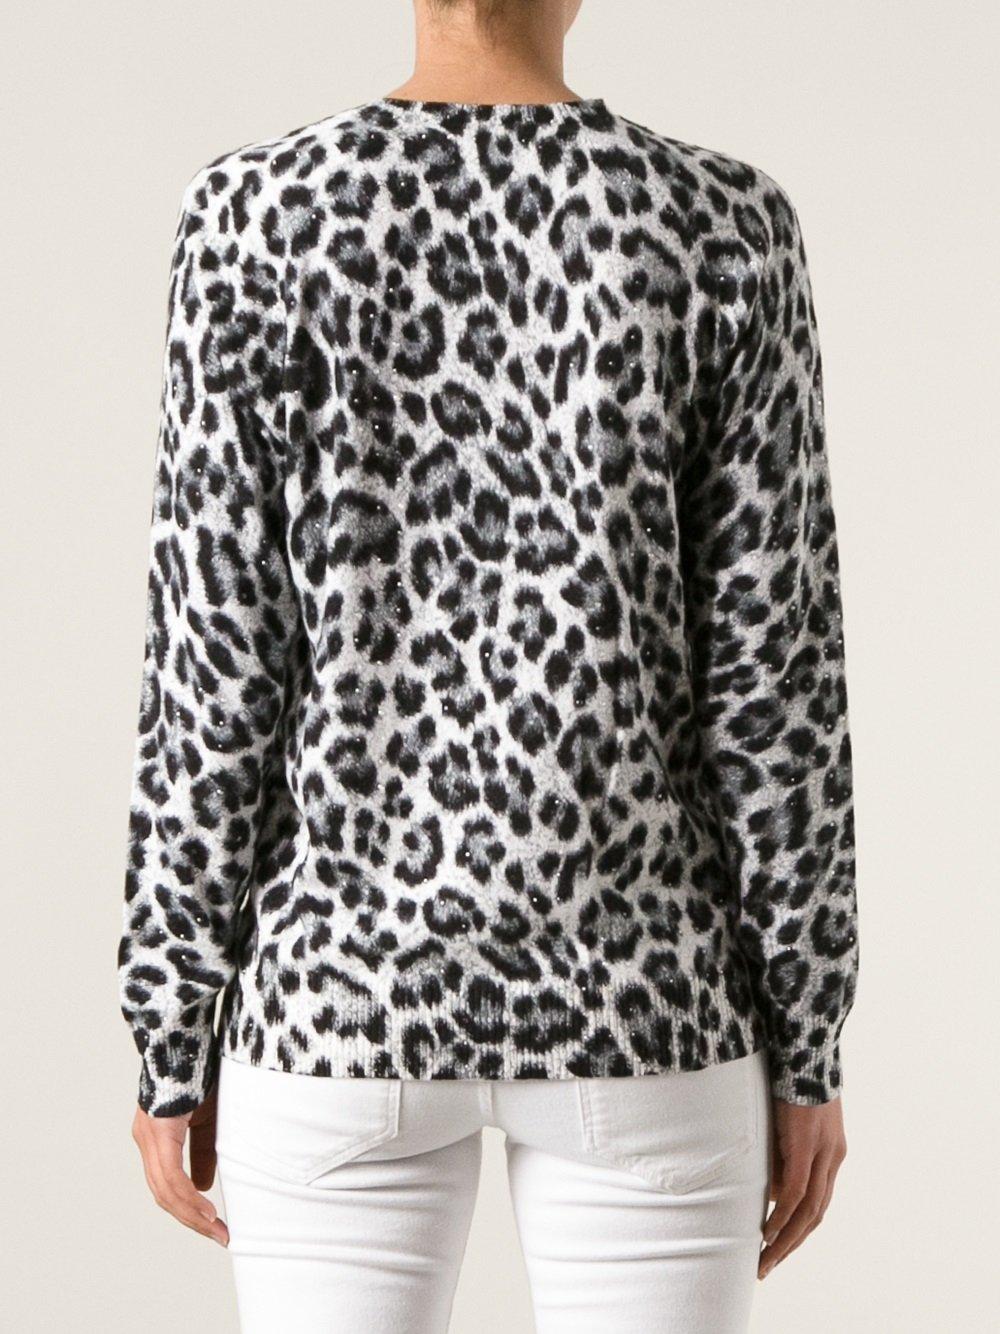 76492e2af02f2d Black Leopard Print Sweater - Best Picture HD Leopard In The World